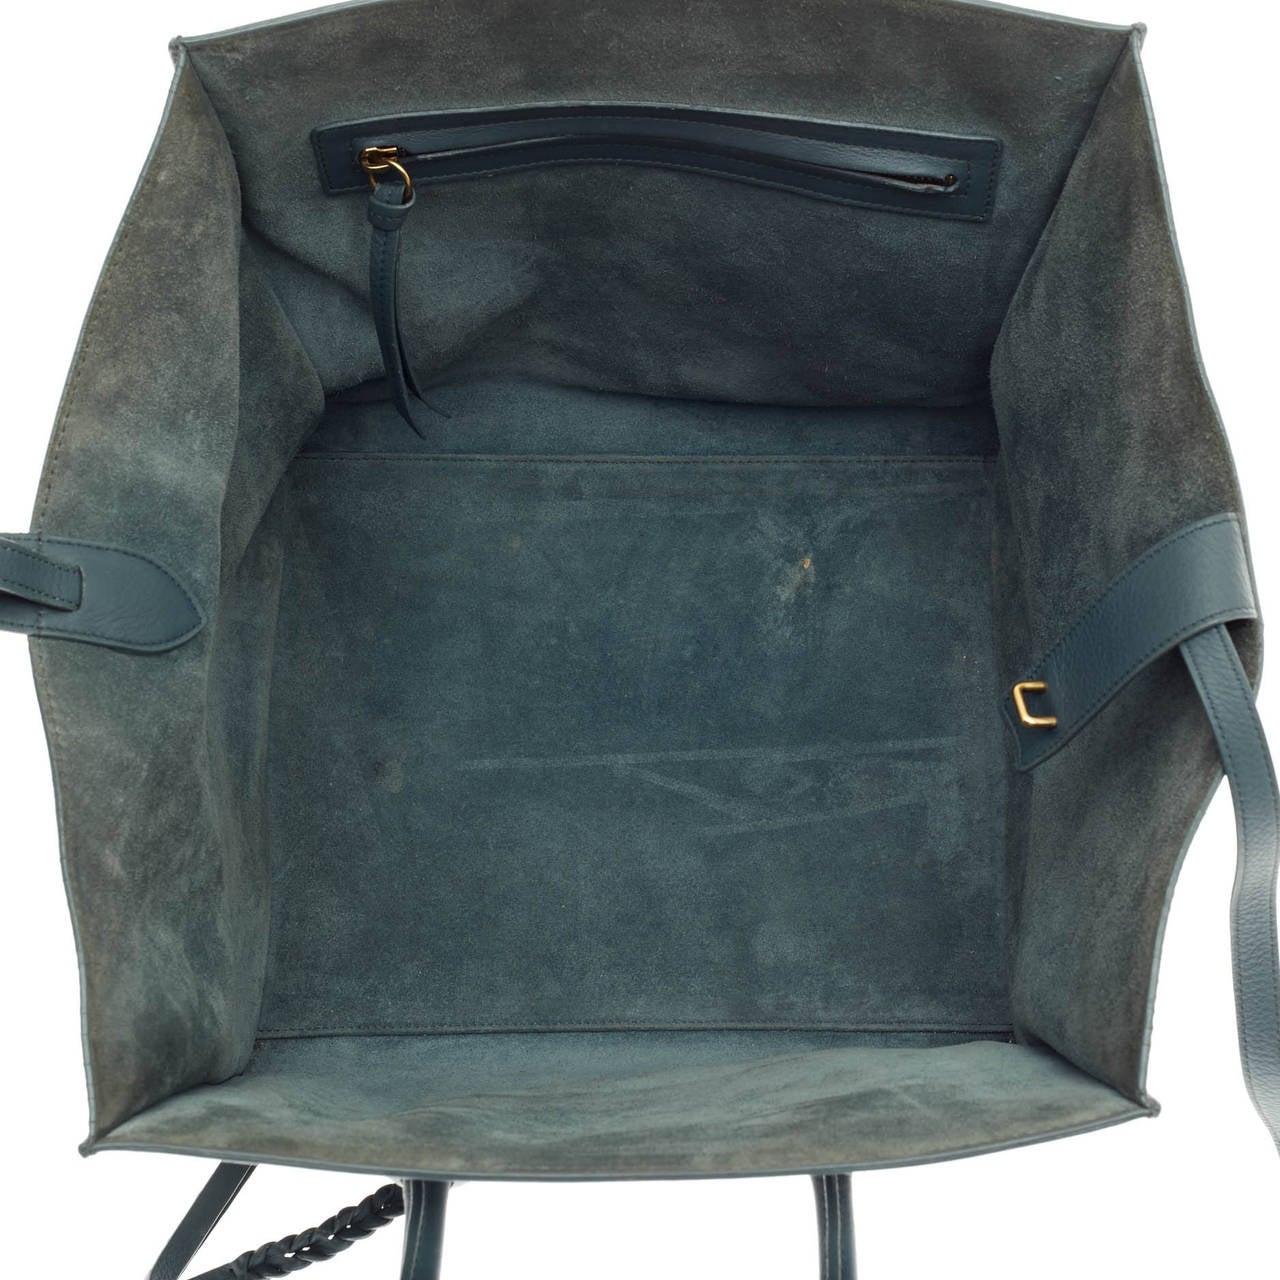 Celine Phantom Smooth Leather Large 6